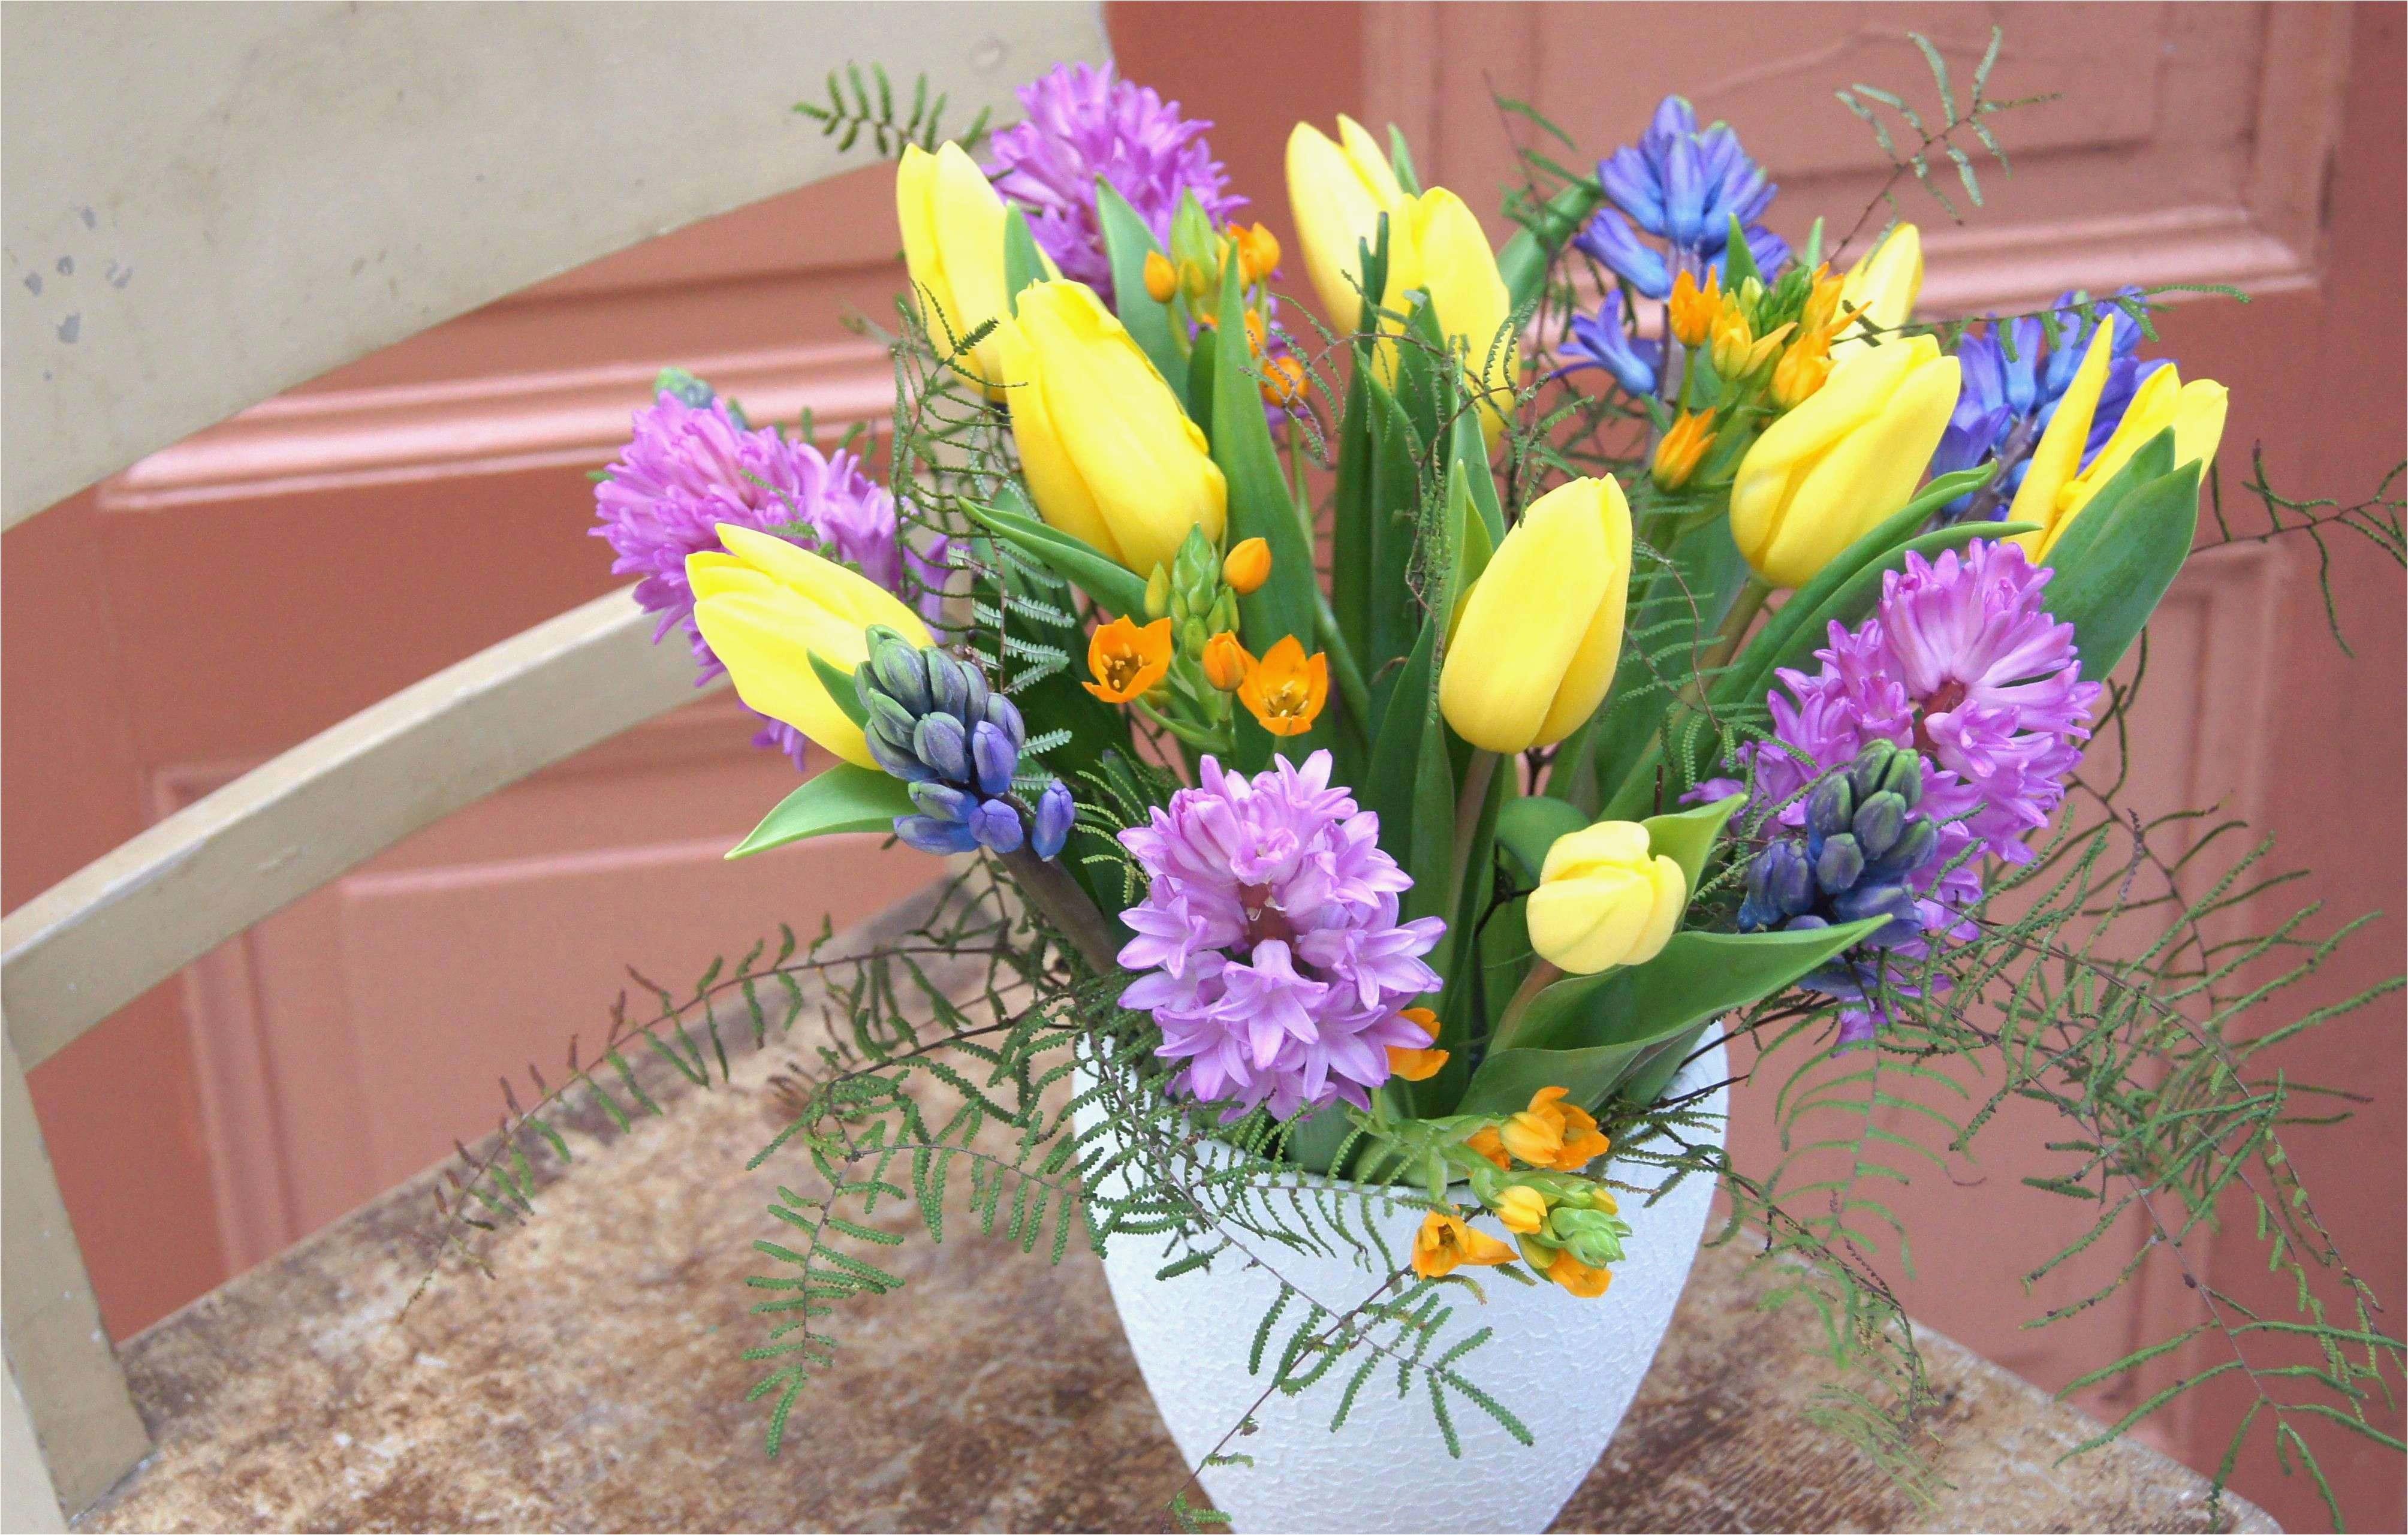 bud vase arrangements ideas of bridal bouquets photo jar flower 1h vases wedding bud vase for bridal bouquets gallery blumenbouquet scha¶n 123 best bridal bouquet pinterest beautiful